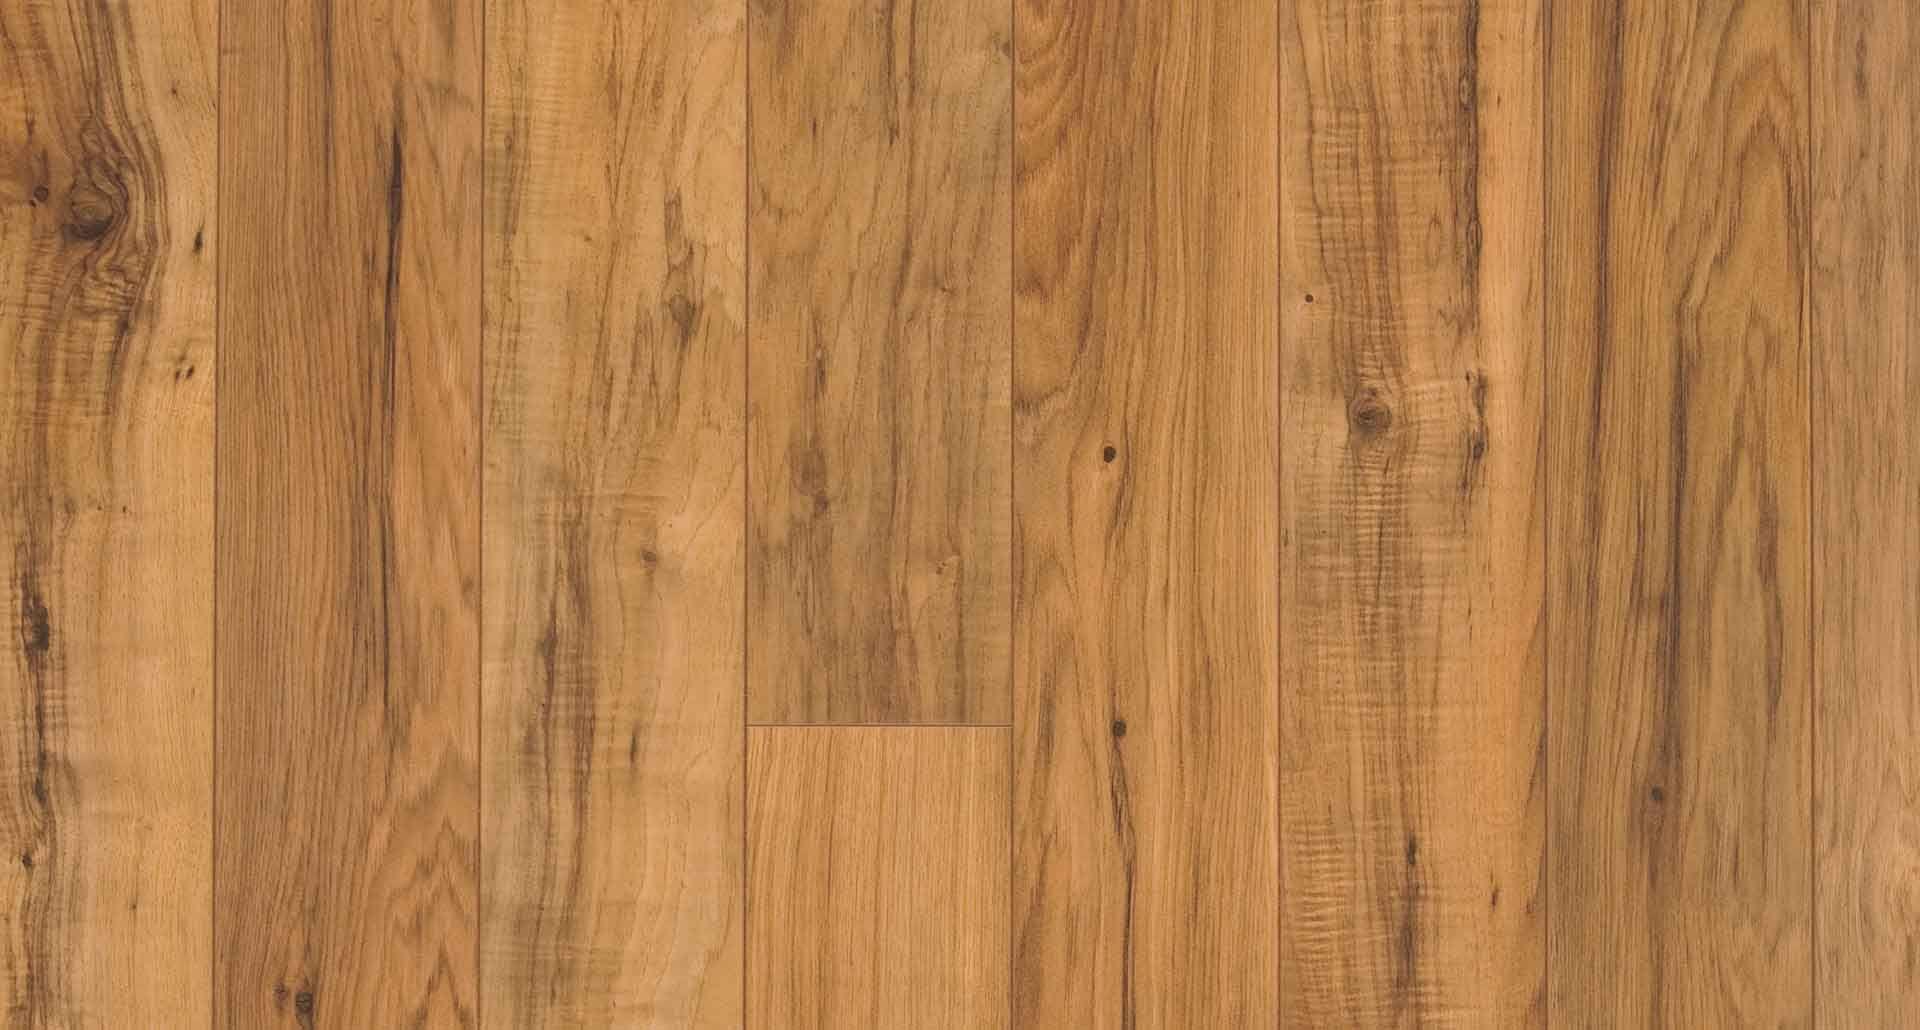 Bristol Chestnut Textured Laminate Floor Medium Wood Finish 10mm 1 Strip Plank